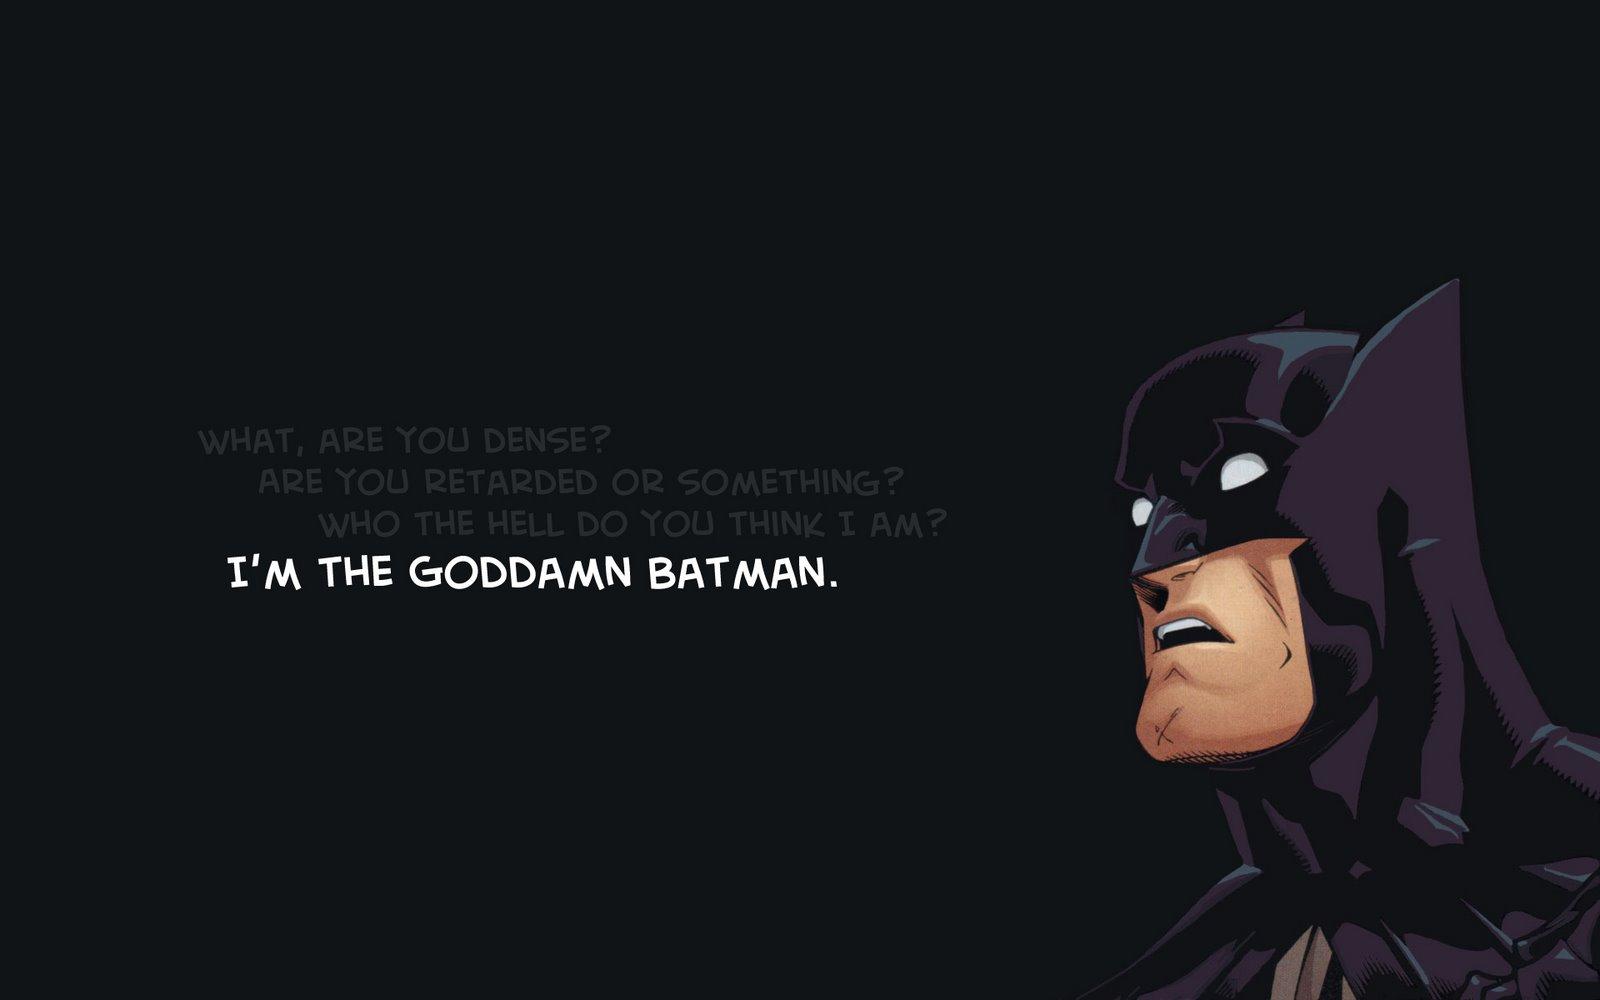 am the good a man batman new xp wallpapers windows7windows8 xp7 pc 1600x1000